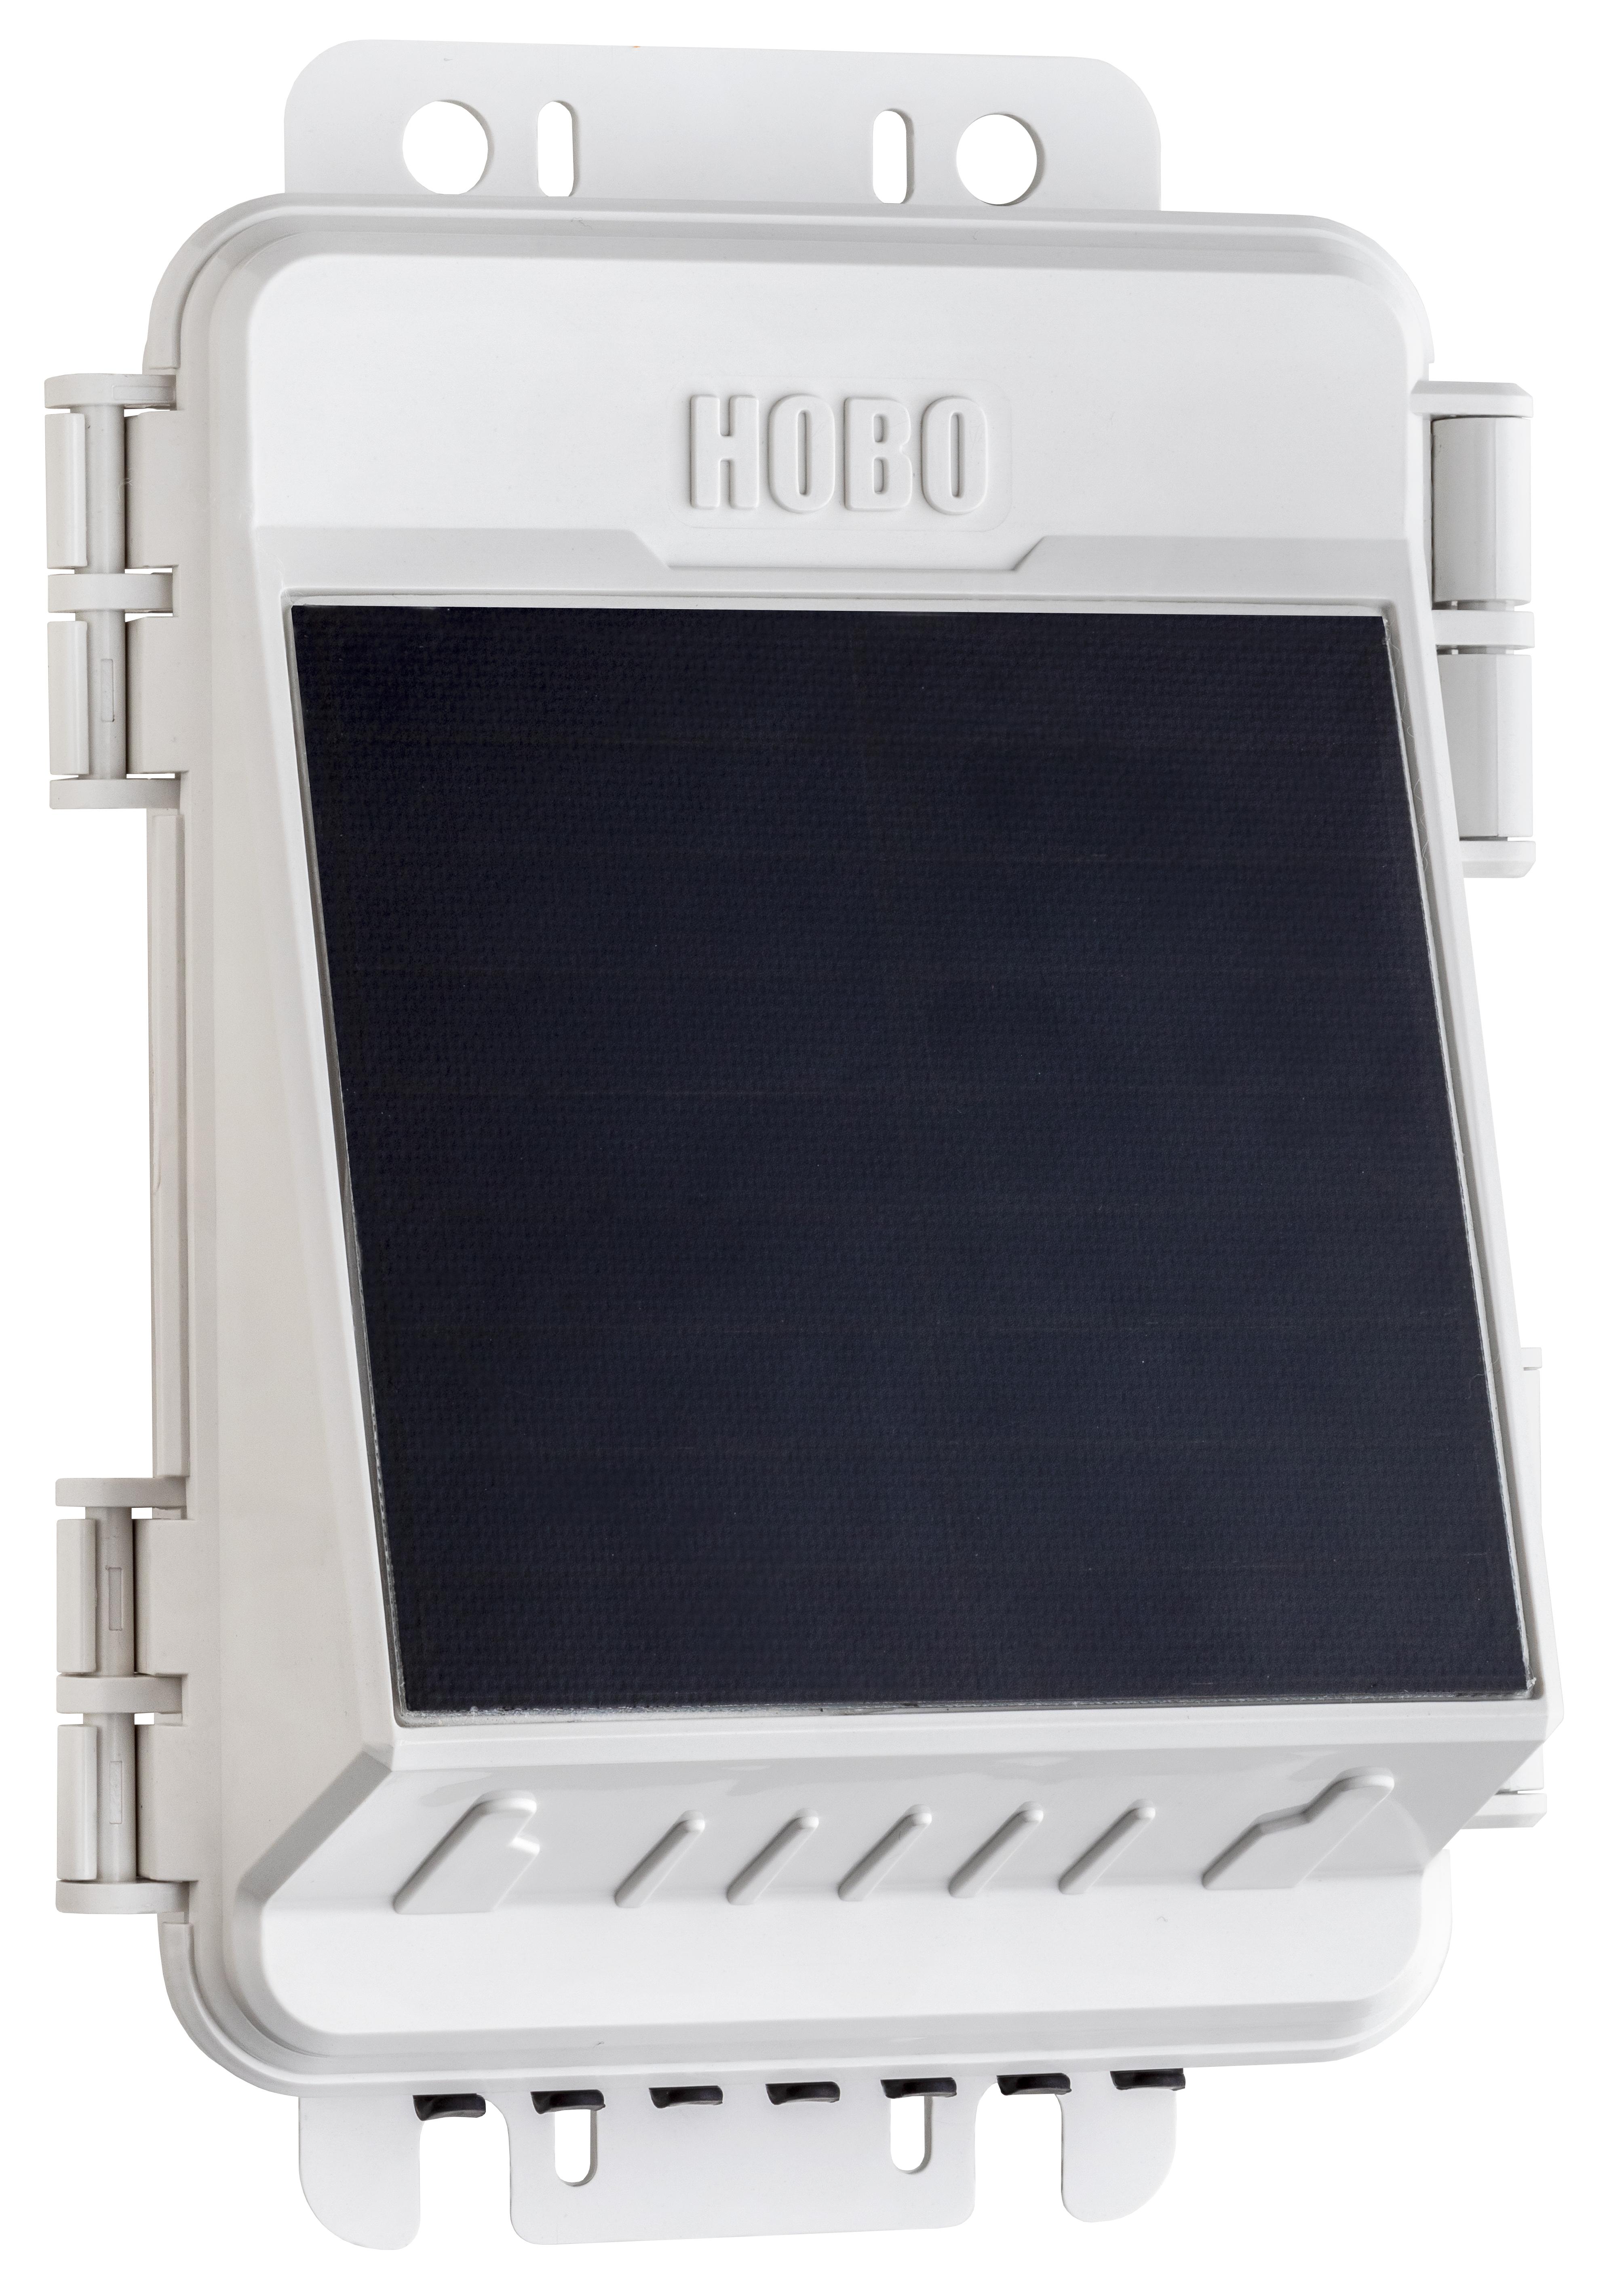 HOBO Micro RX Station 2106 für HOBOnet